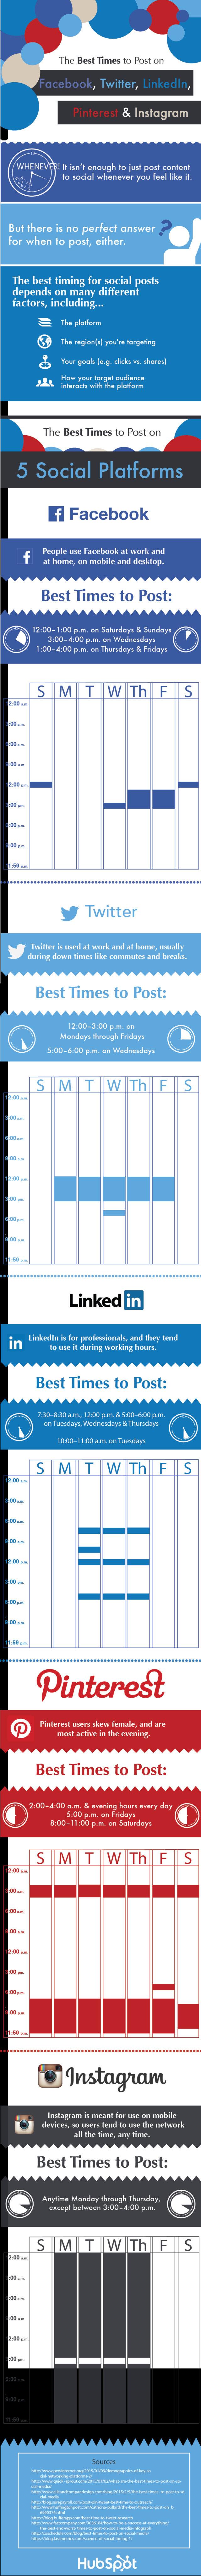 The Best times to post on #Twitter #Linkedin #Pinterest #Instagram #Linkedin #SMM #Infographic